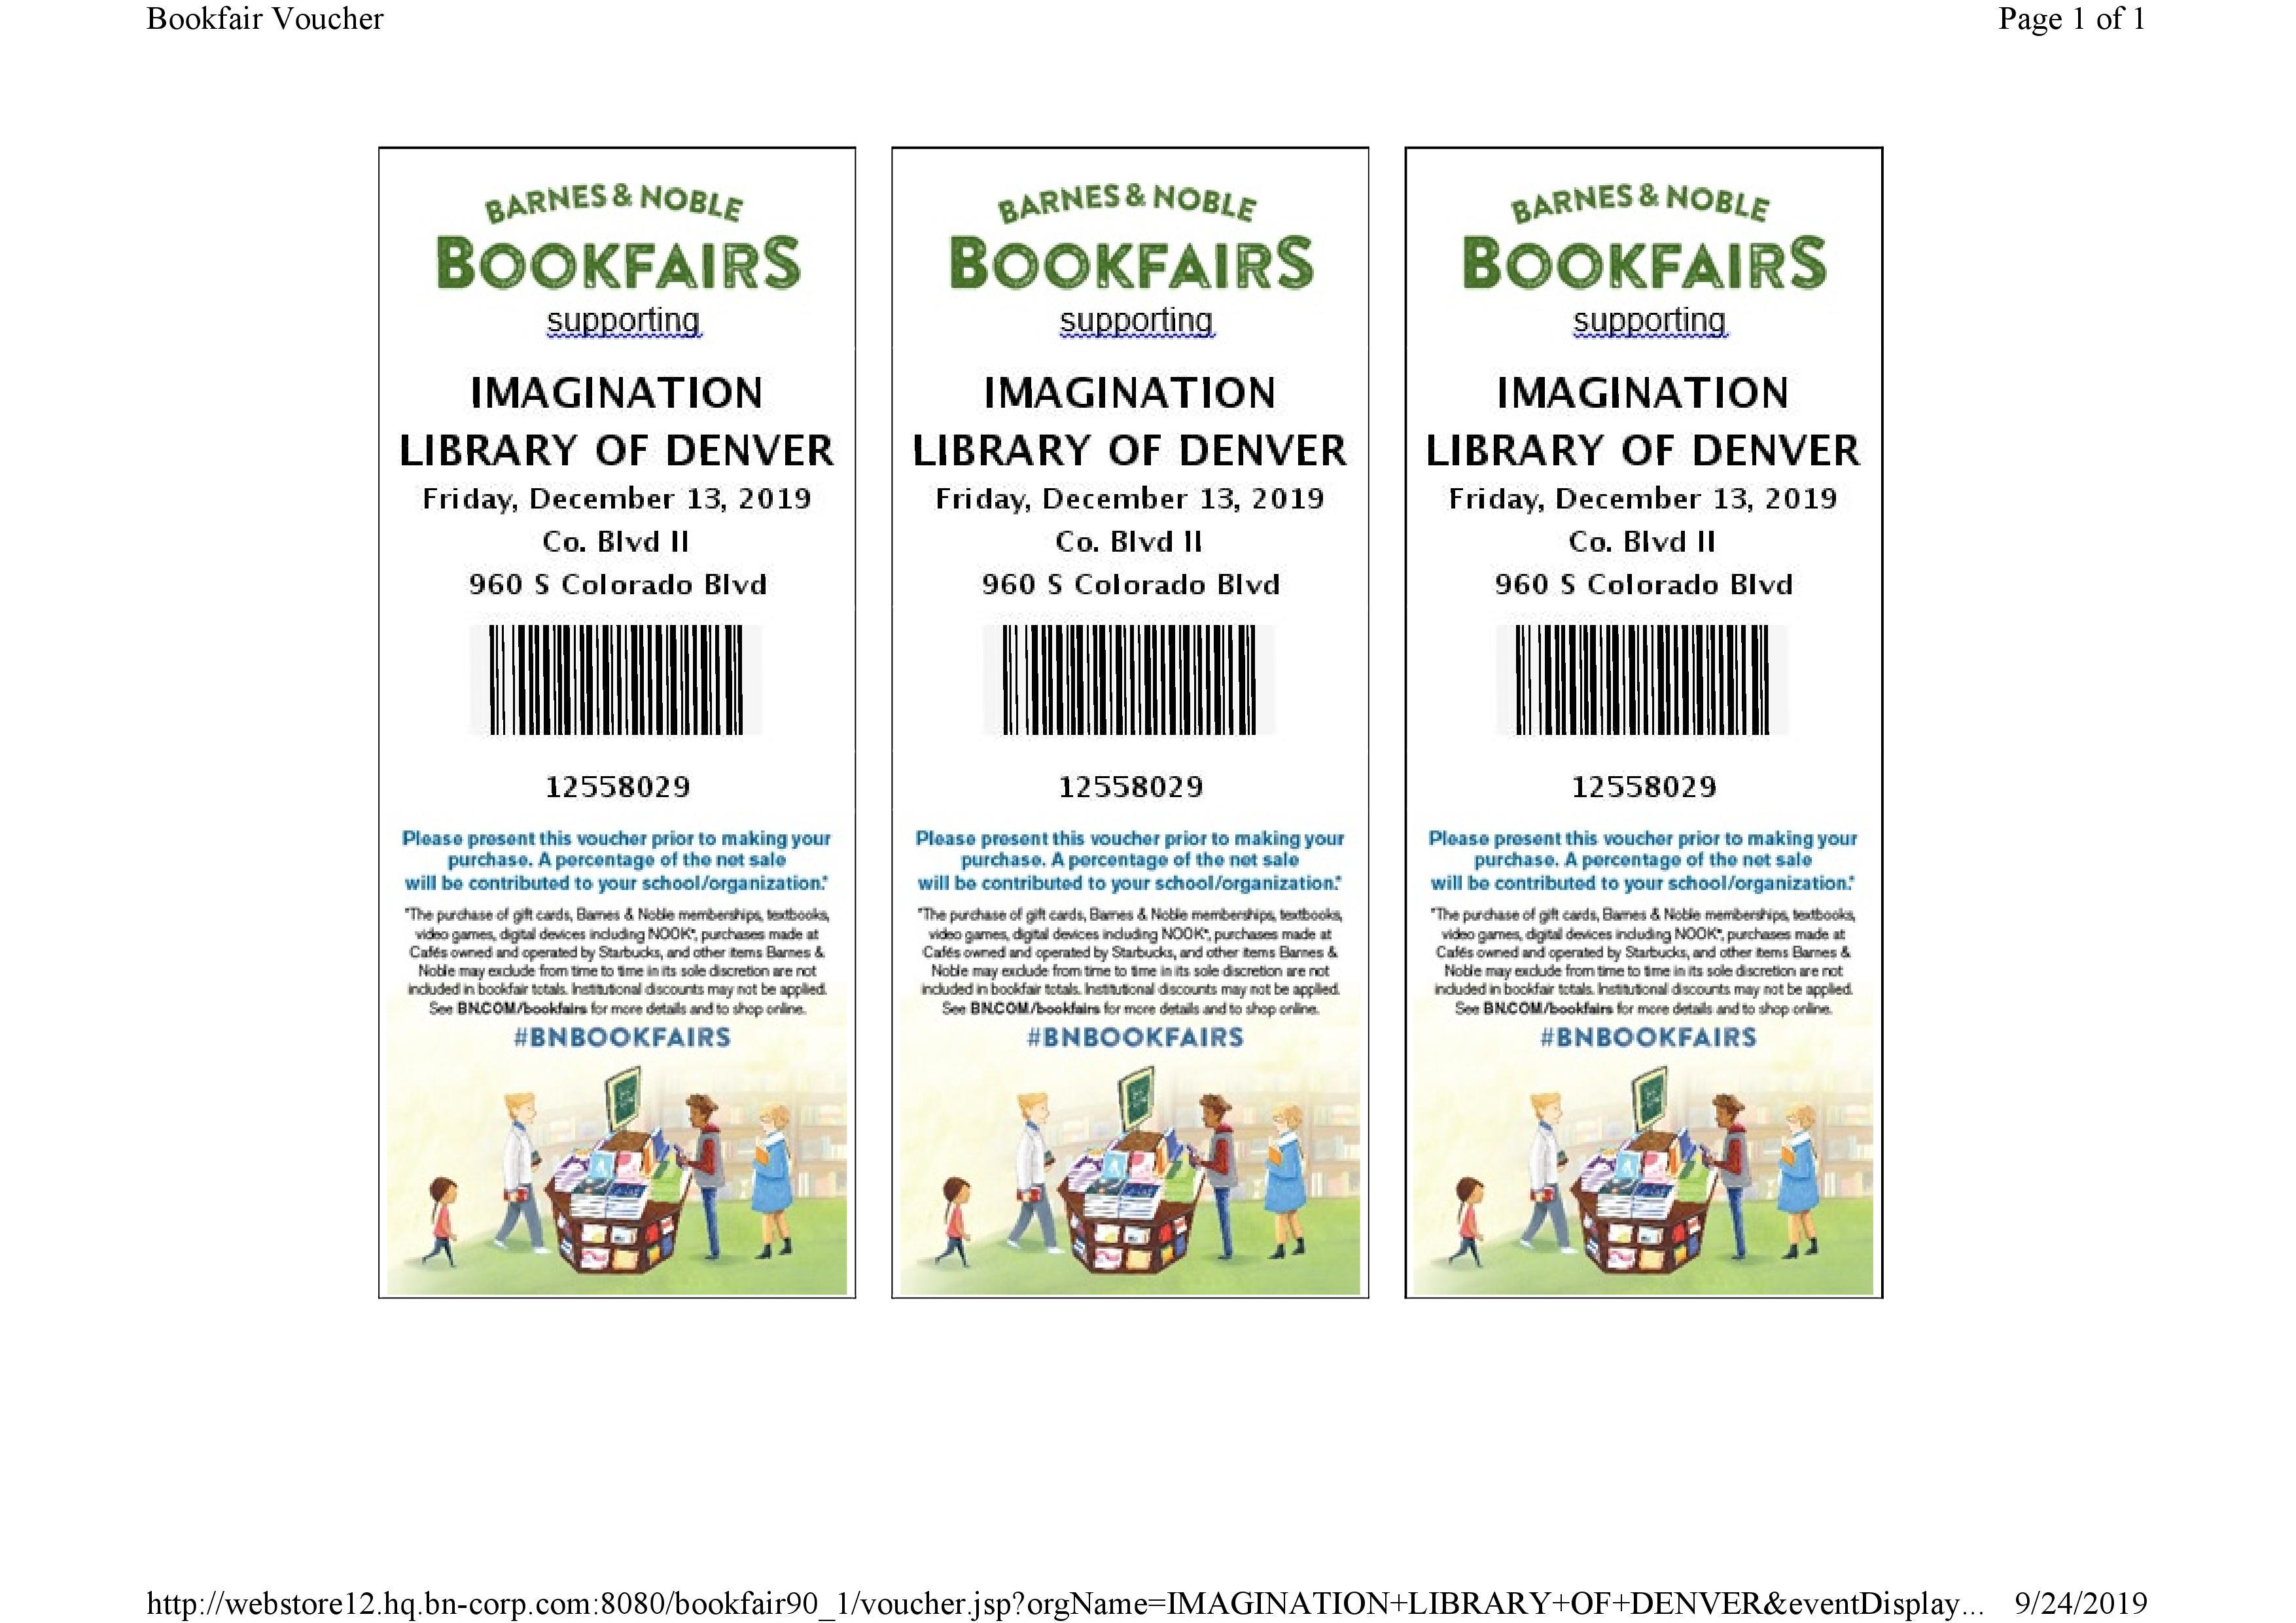 Barnes & Noble Book Fair & Fundraiser